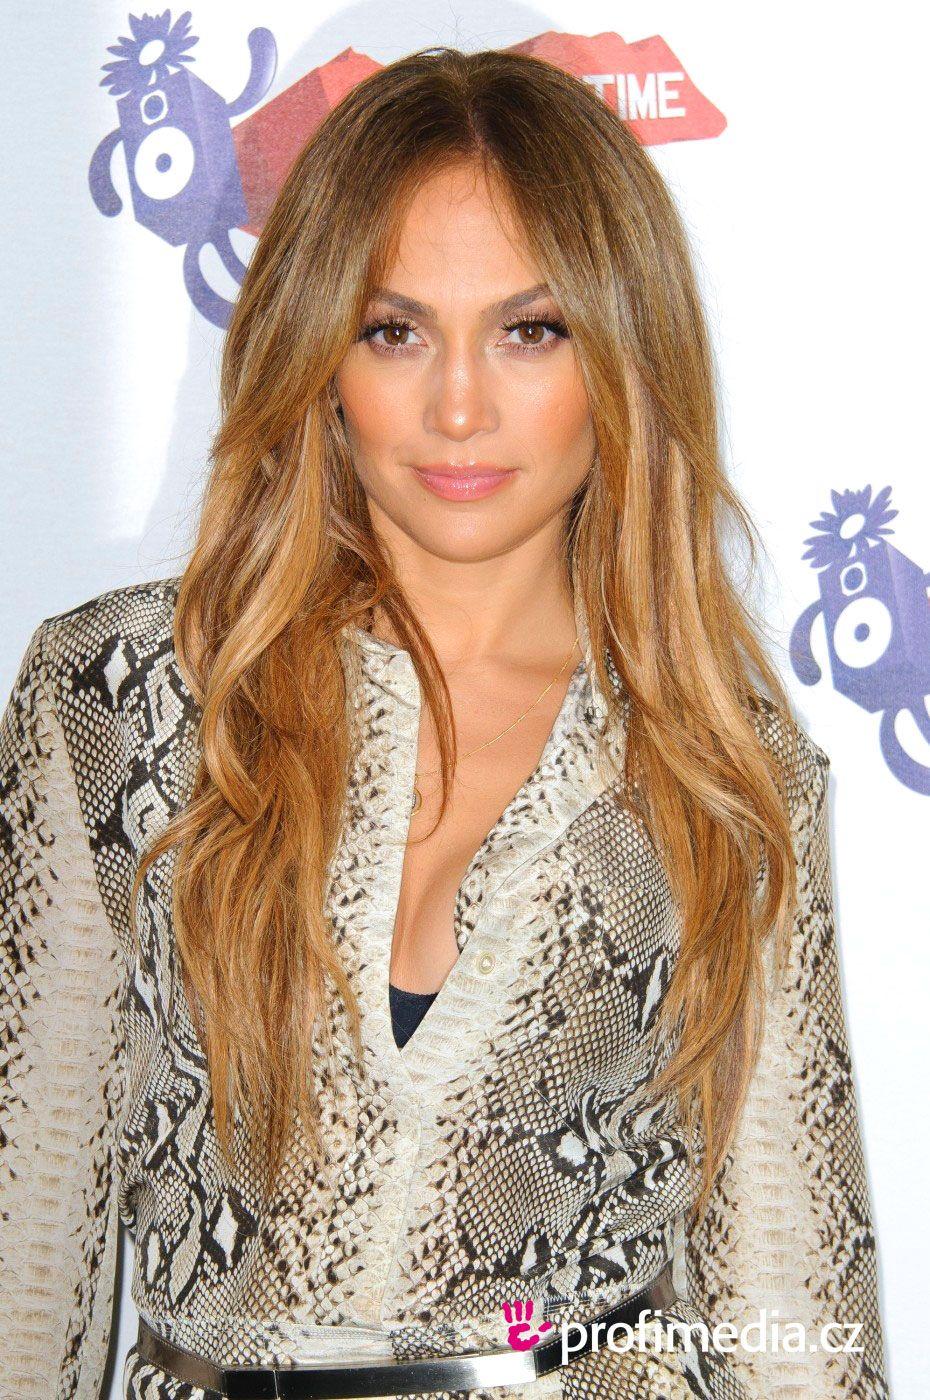 Jlo Hair Fryzura Gwiazdy Jennifer Lopez Jennifer Lopez